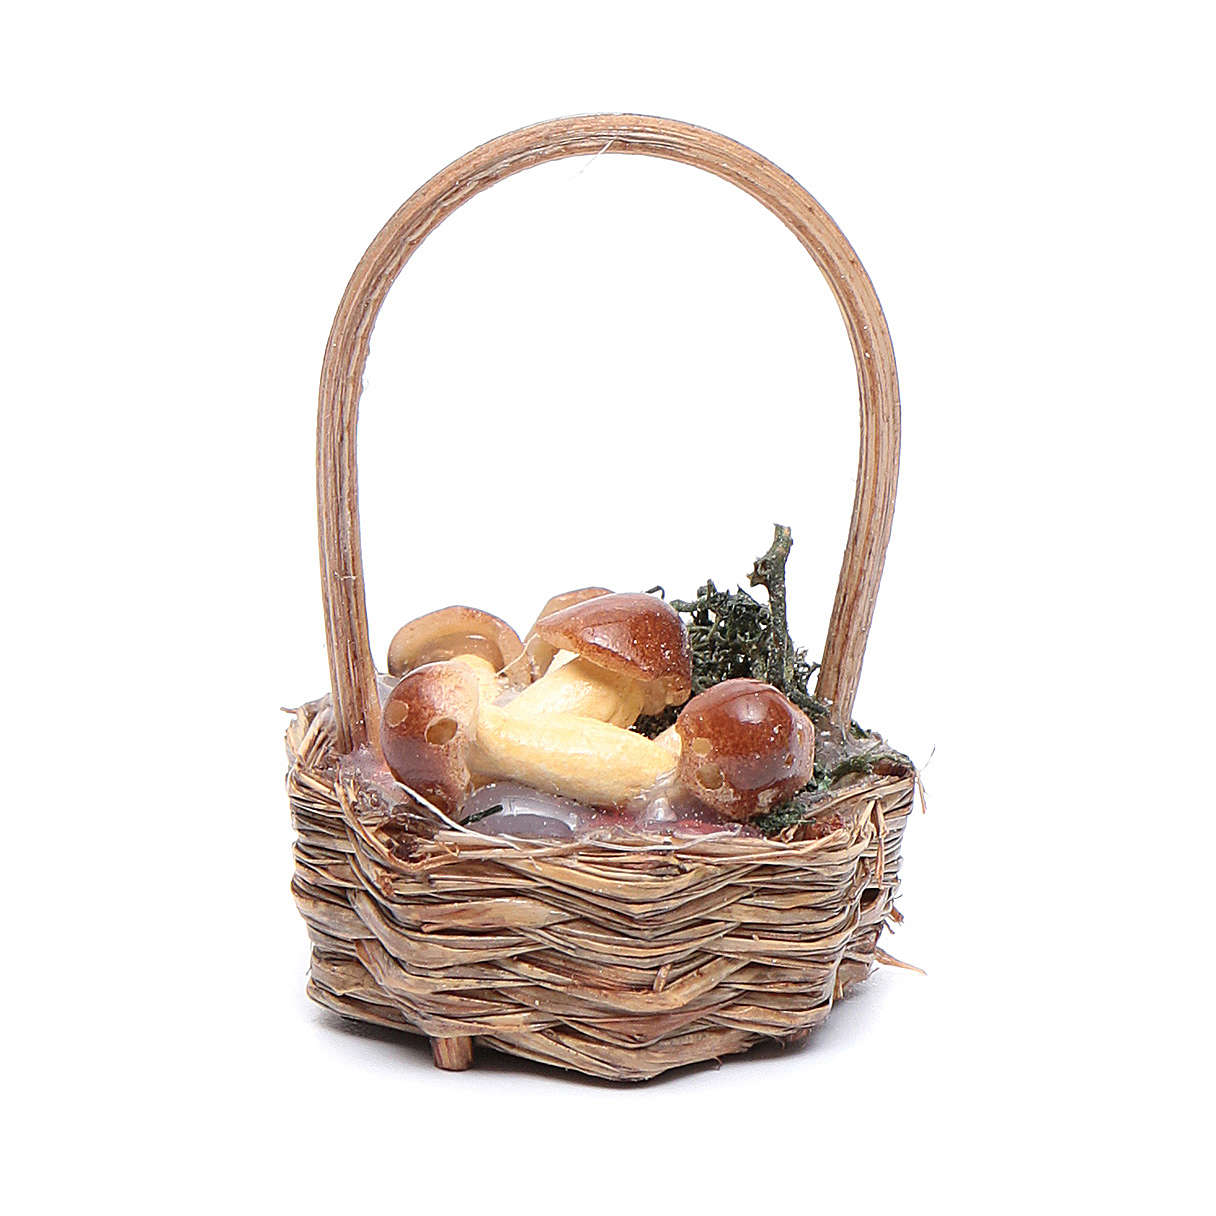 Basket with mushrooms for Neapolitan nativity scene 4